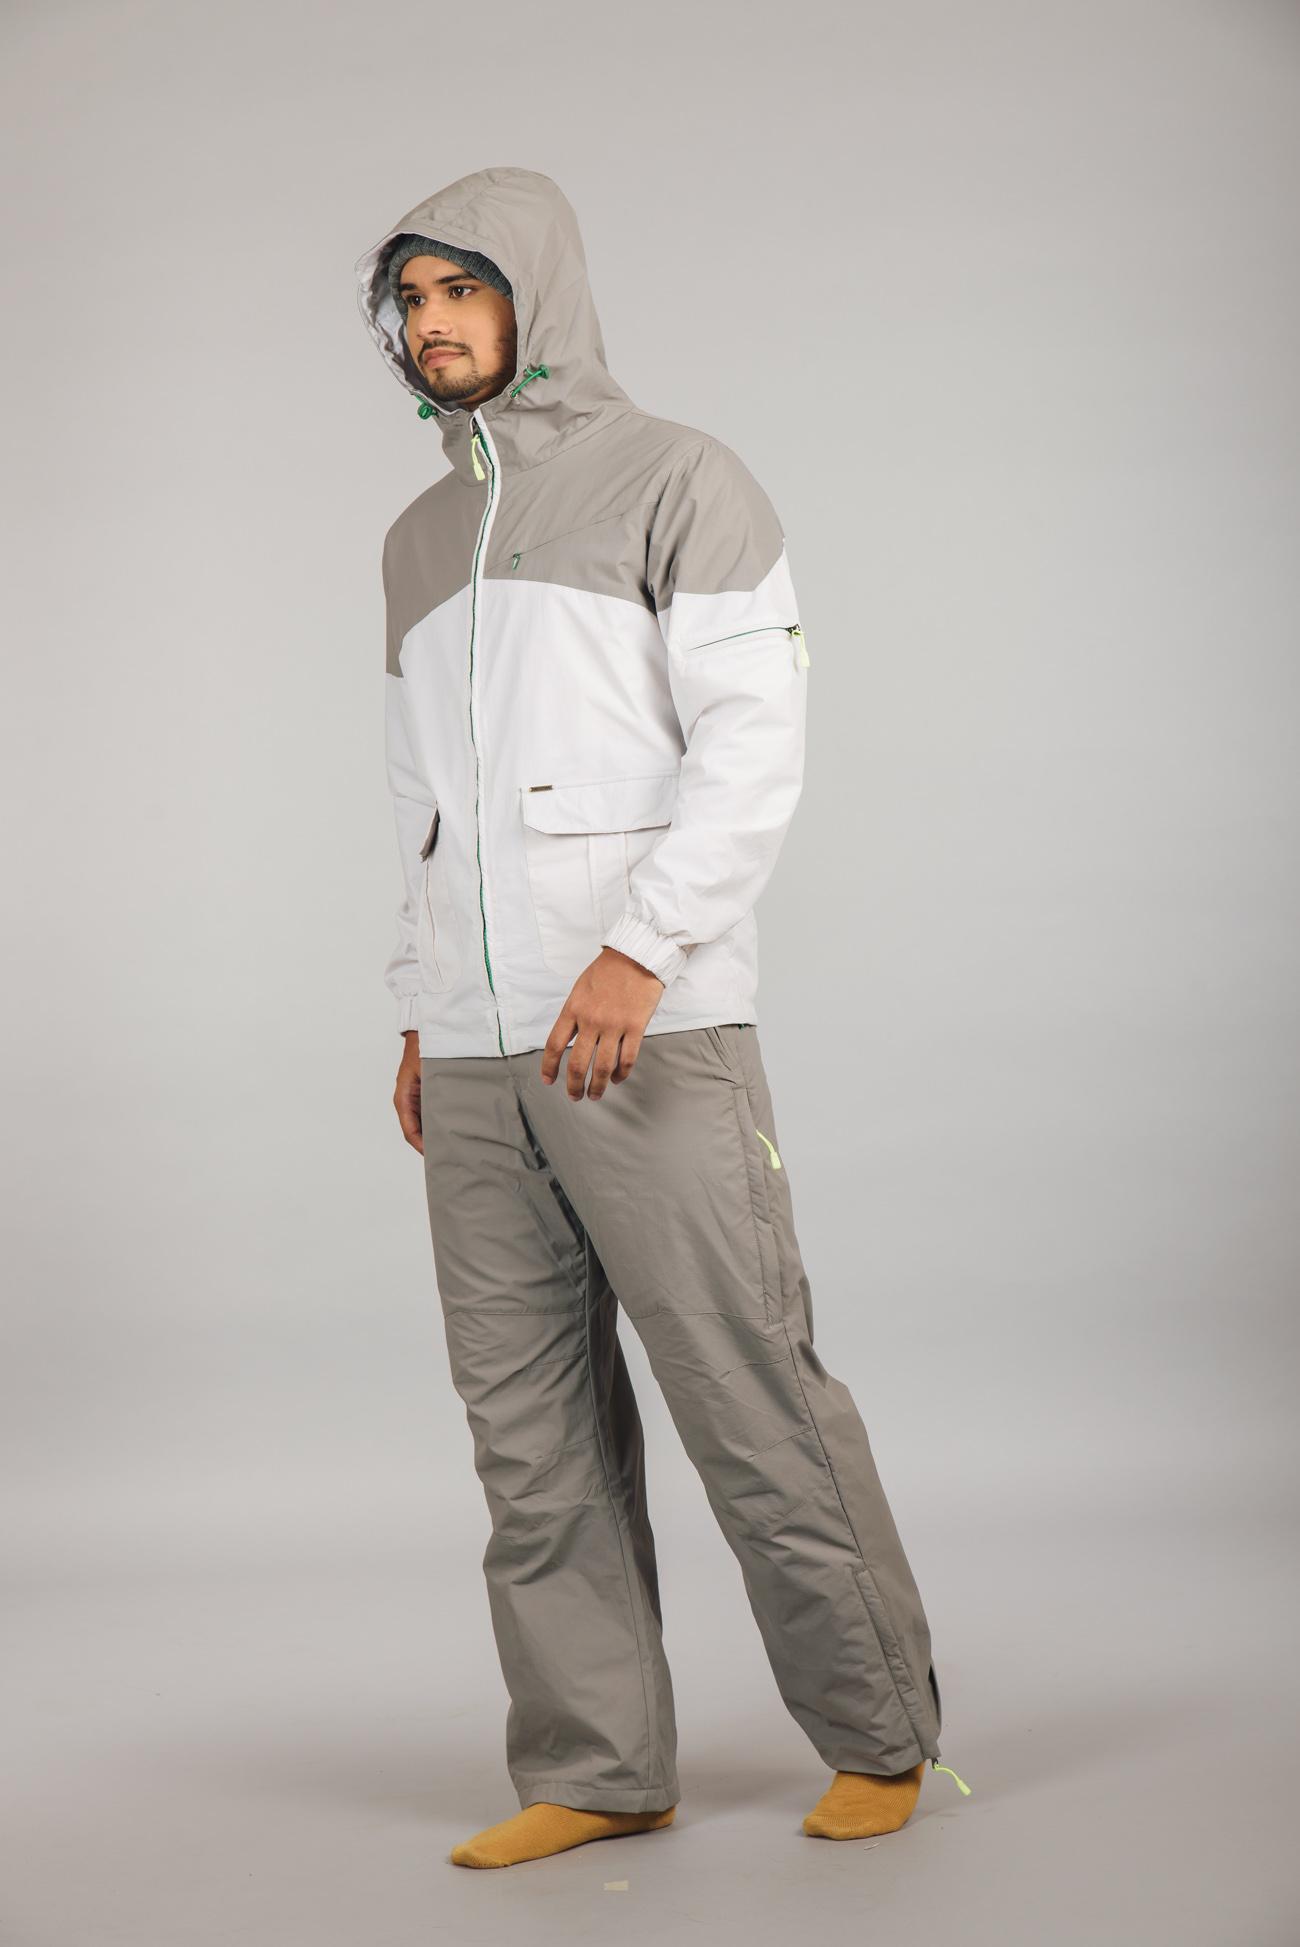 Kosha's Hardshell Waterproof Jacket